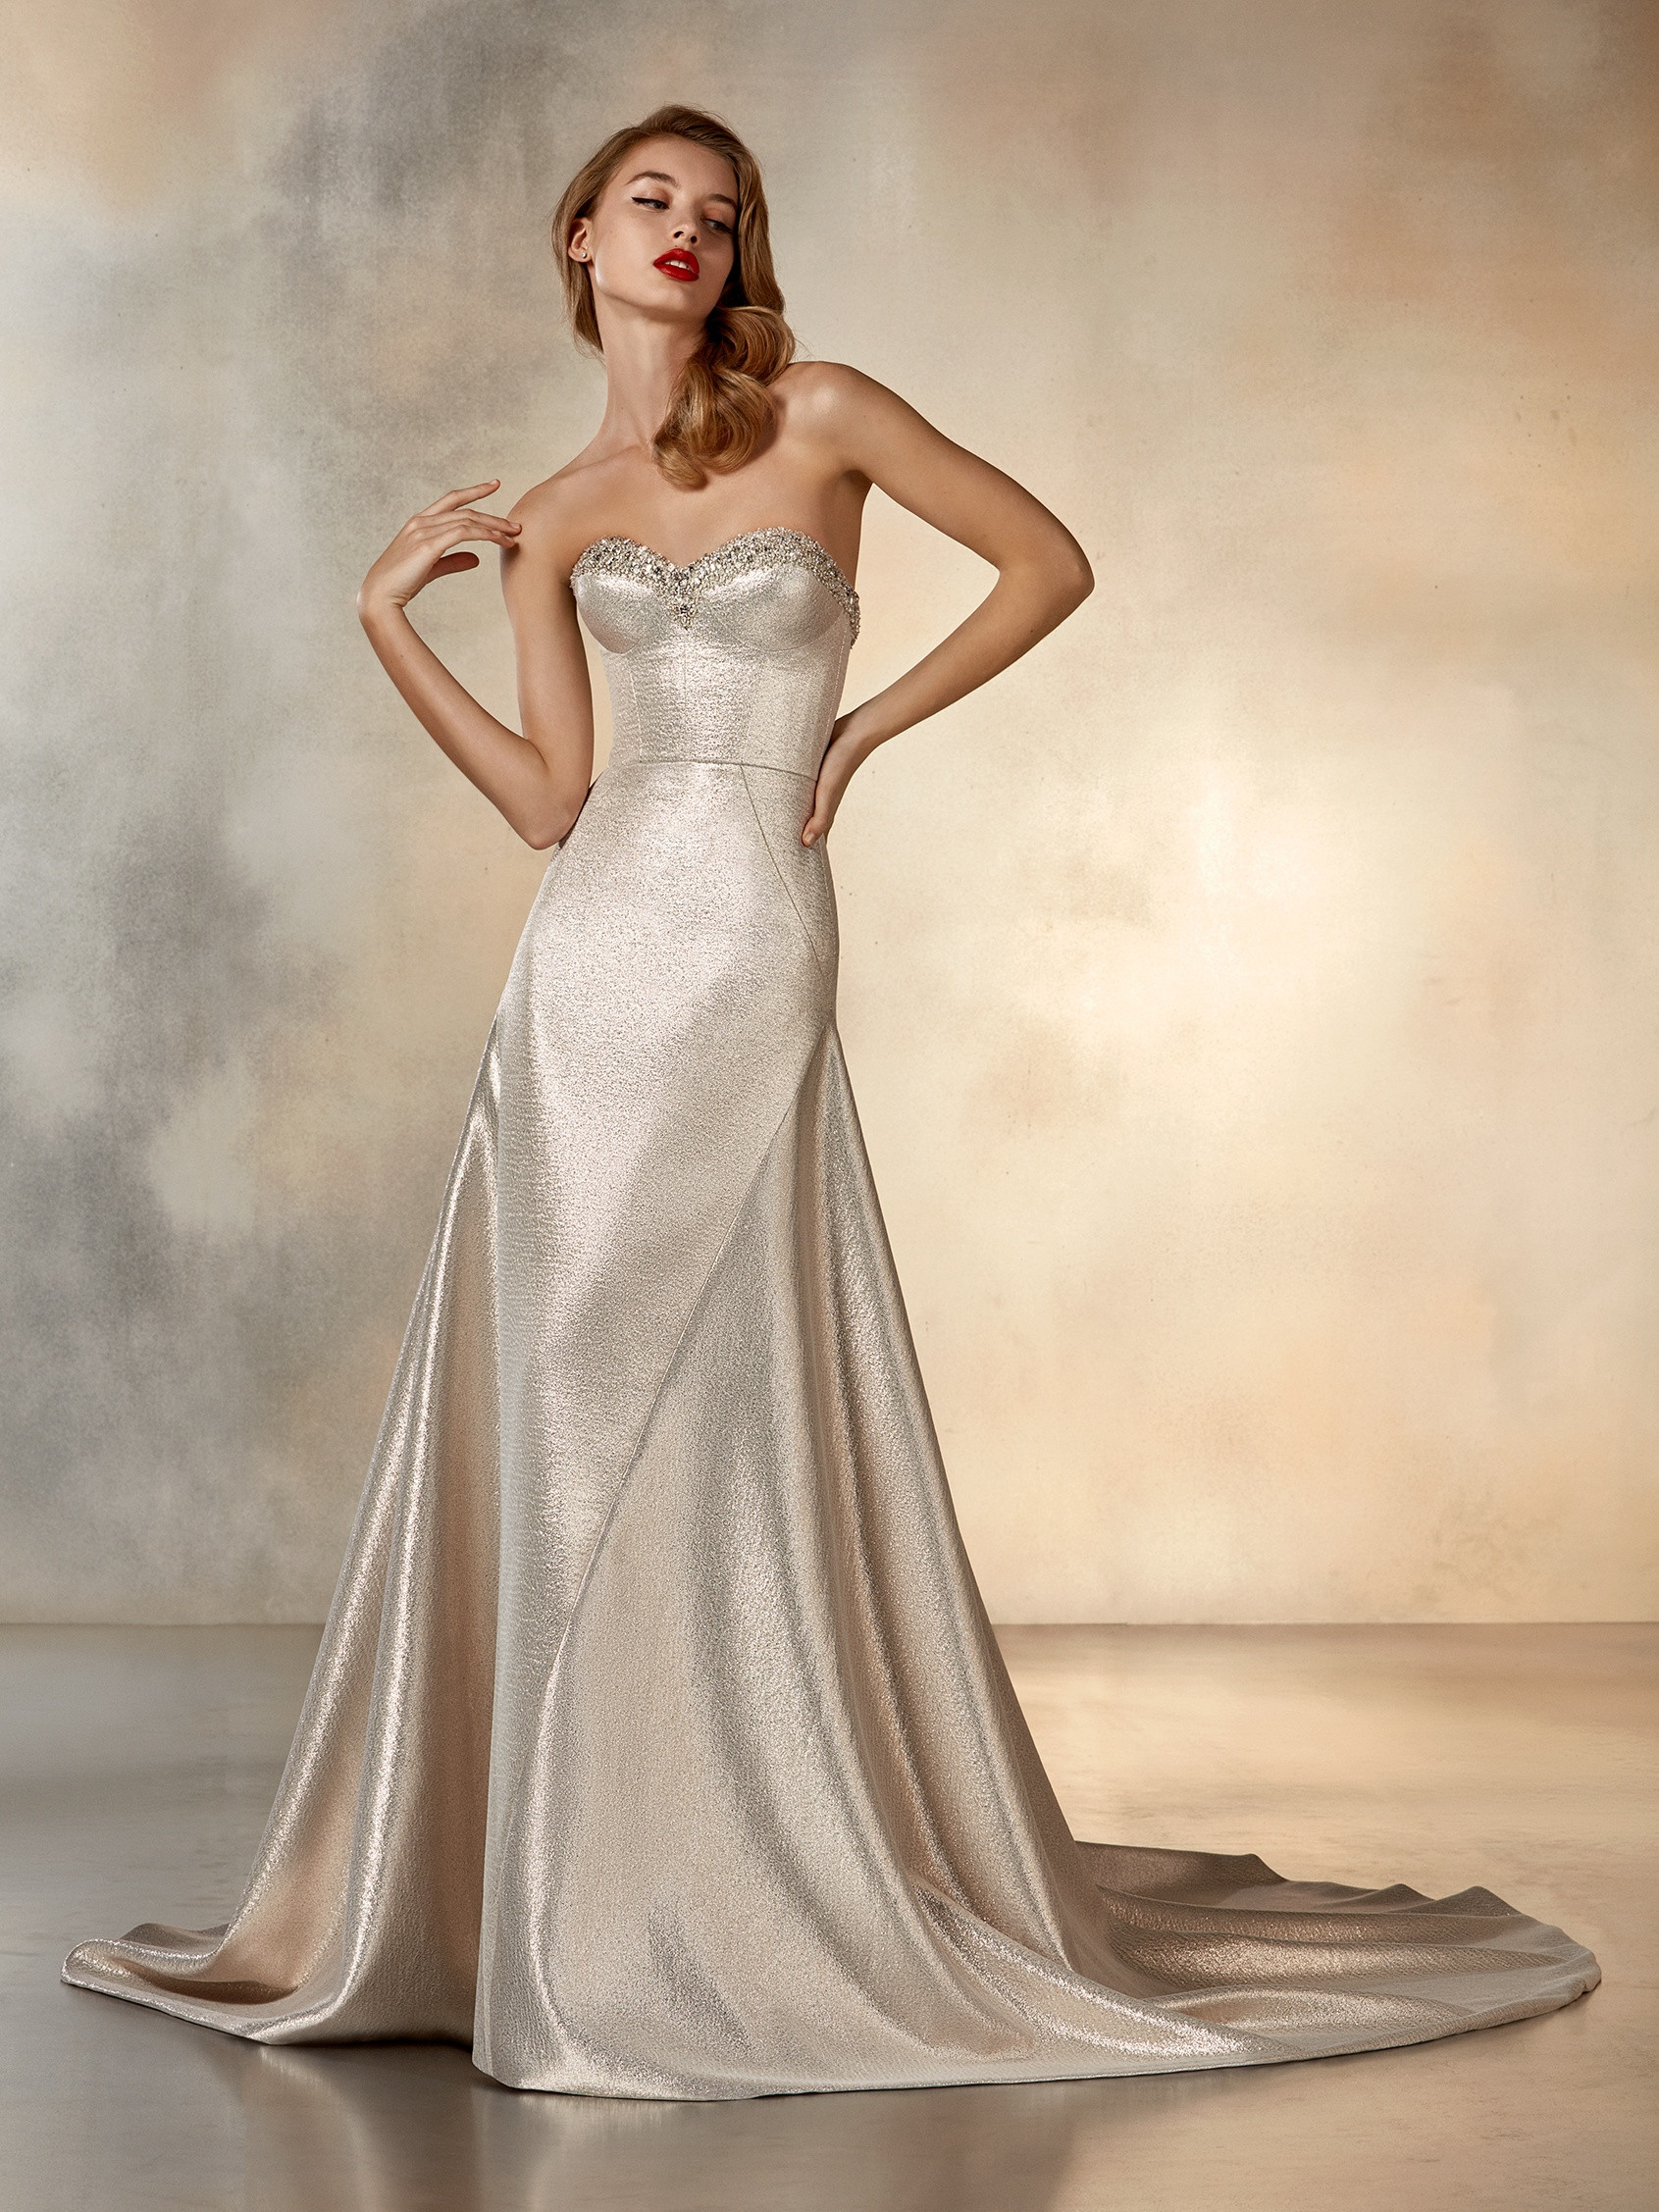 Mira Couture Pronovias Rising Wedding Dress Bridal Gown Barcelona Designer Chicago Boutique